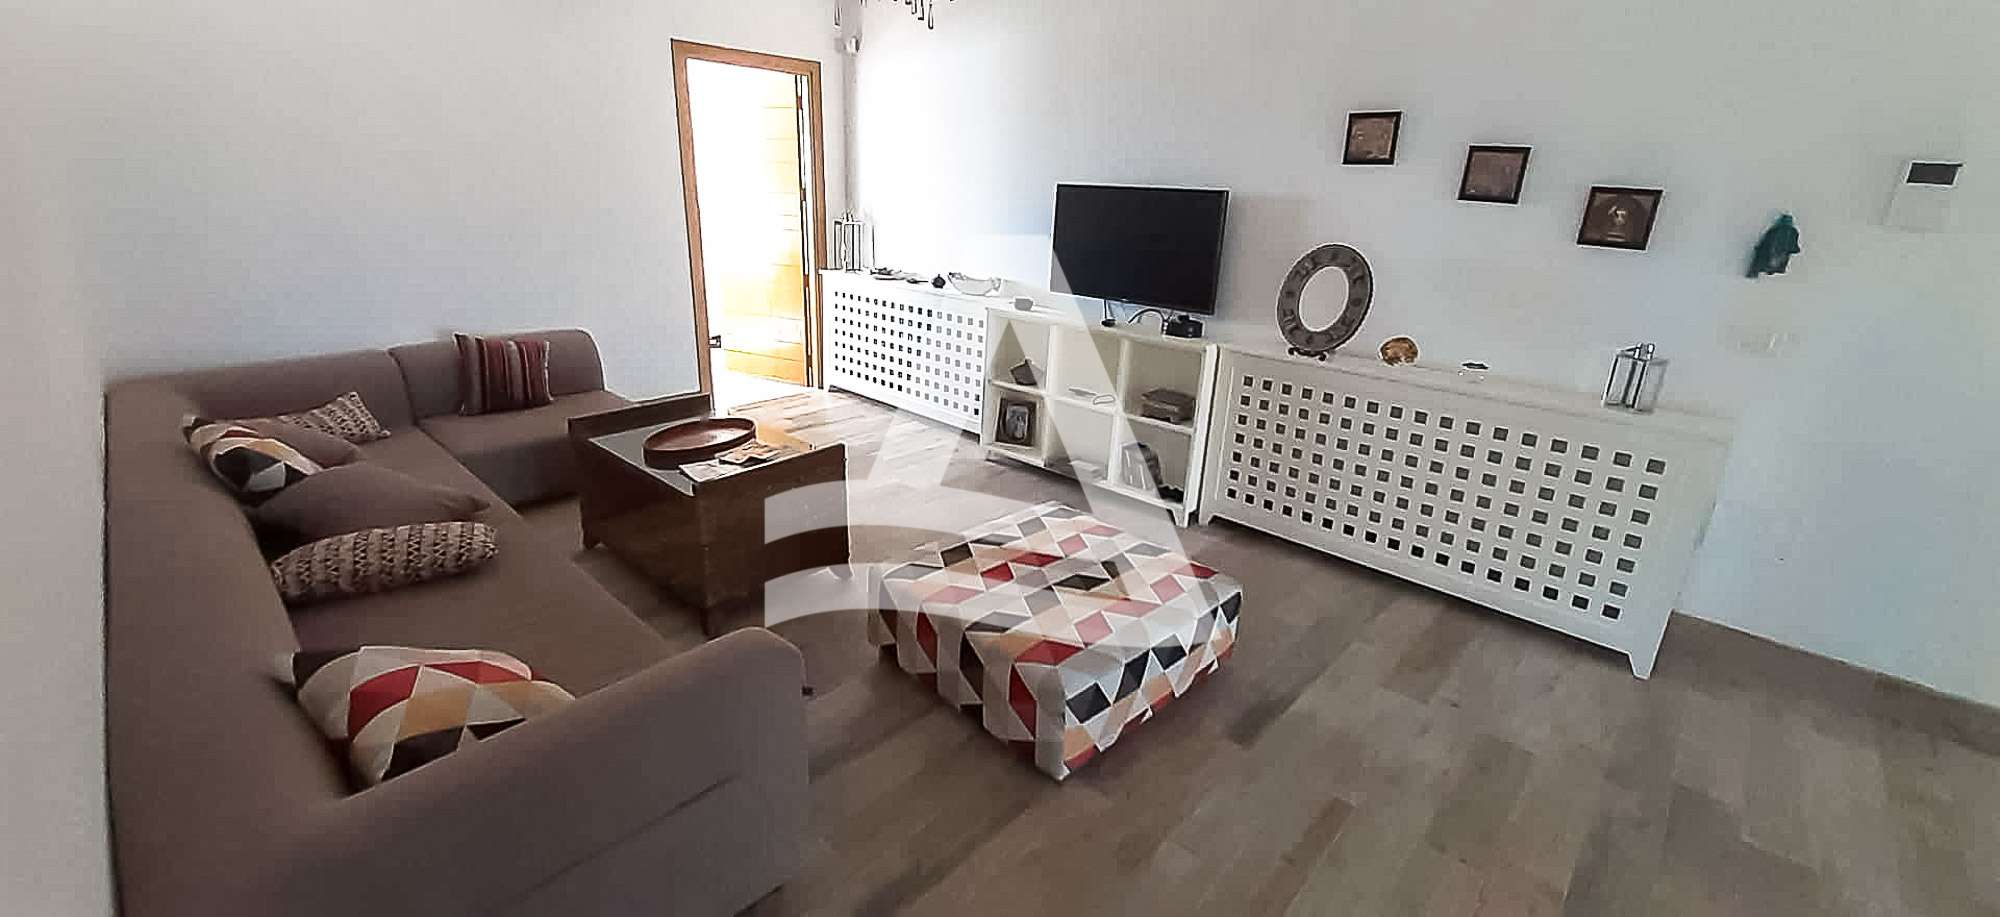 httpss3.amazonaws.comlogimoaws_Arcane_immobilière_la_Marsa-_location_-_vente_la_marsa_11_sur_21_1574354370821-1